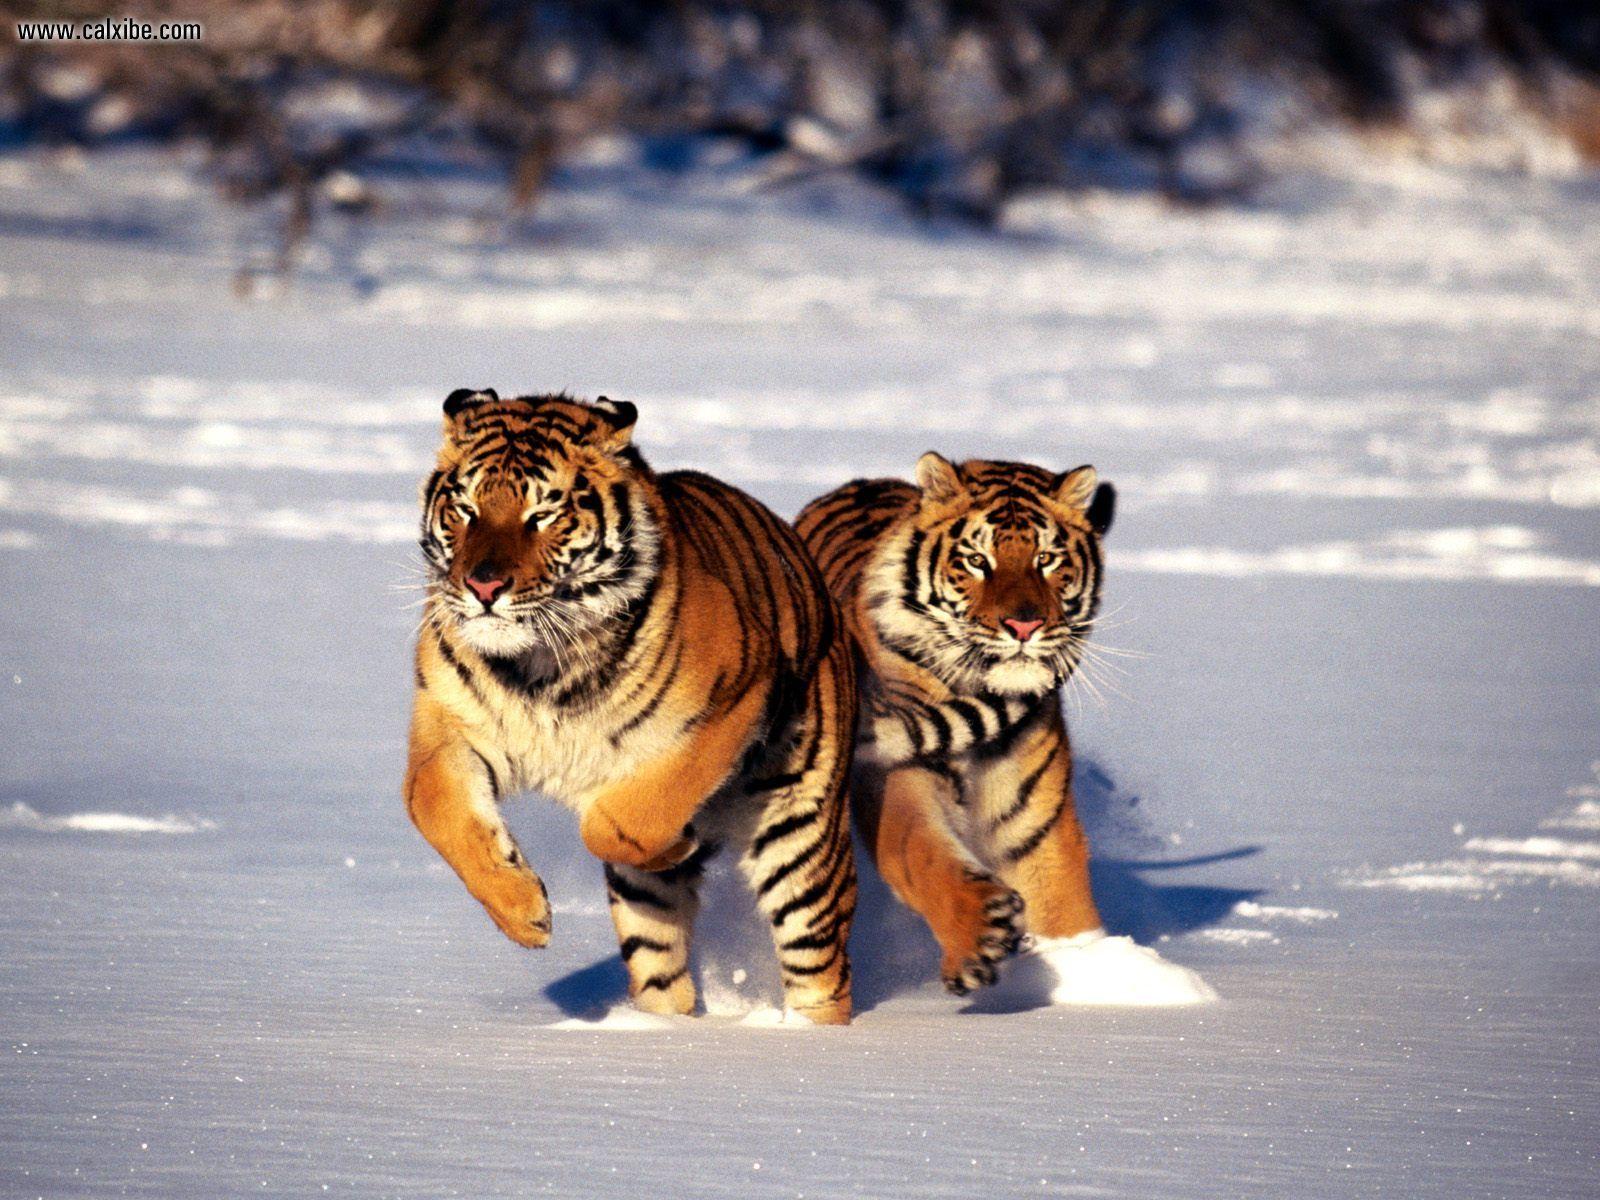 Siberian Tiger Full Screen Apple Wallpaper Tiger 1016 high quality 1600x1200